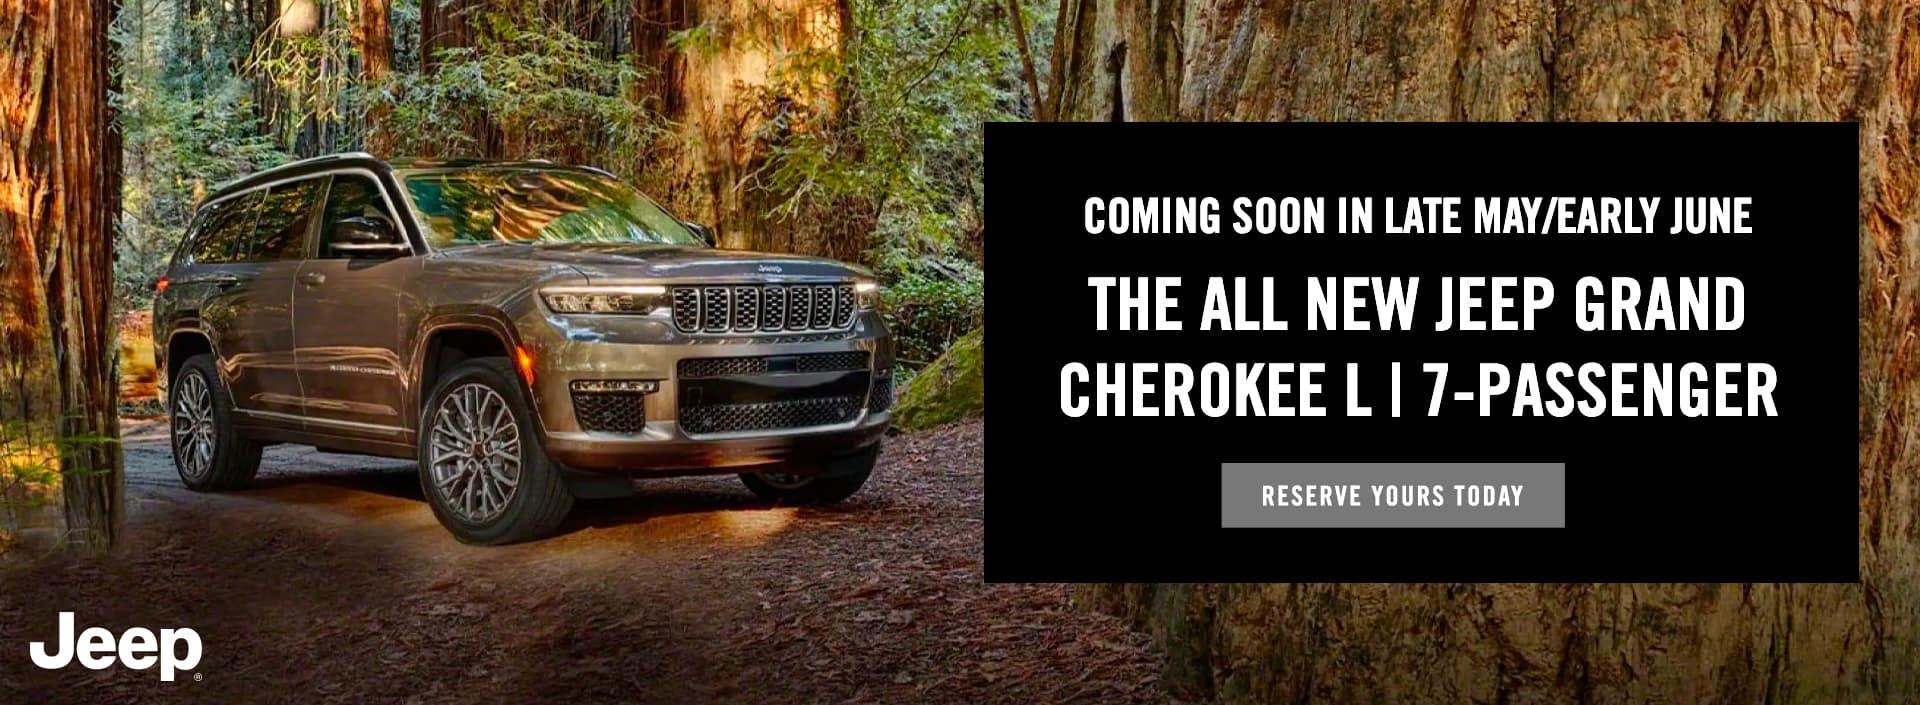 EAG_Jeep_grand cherokee L